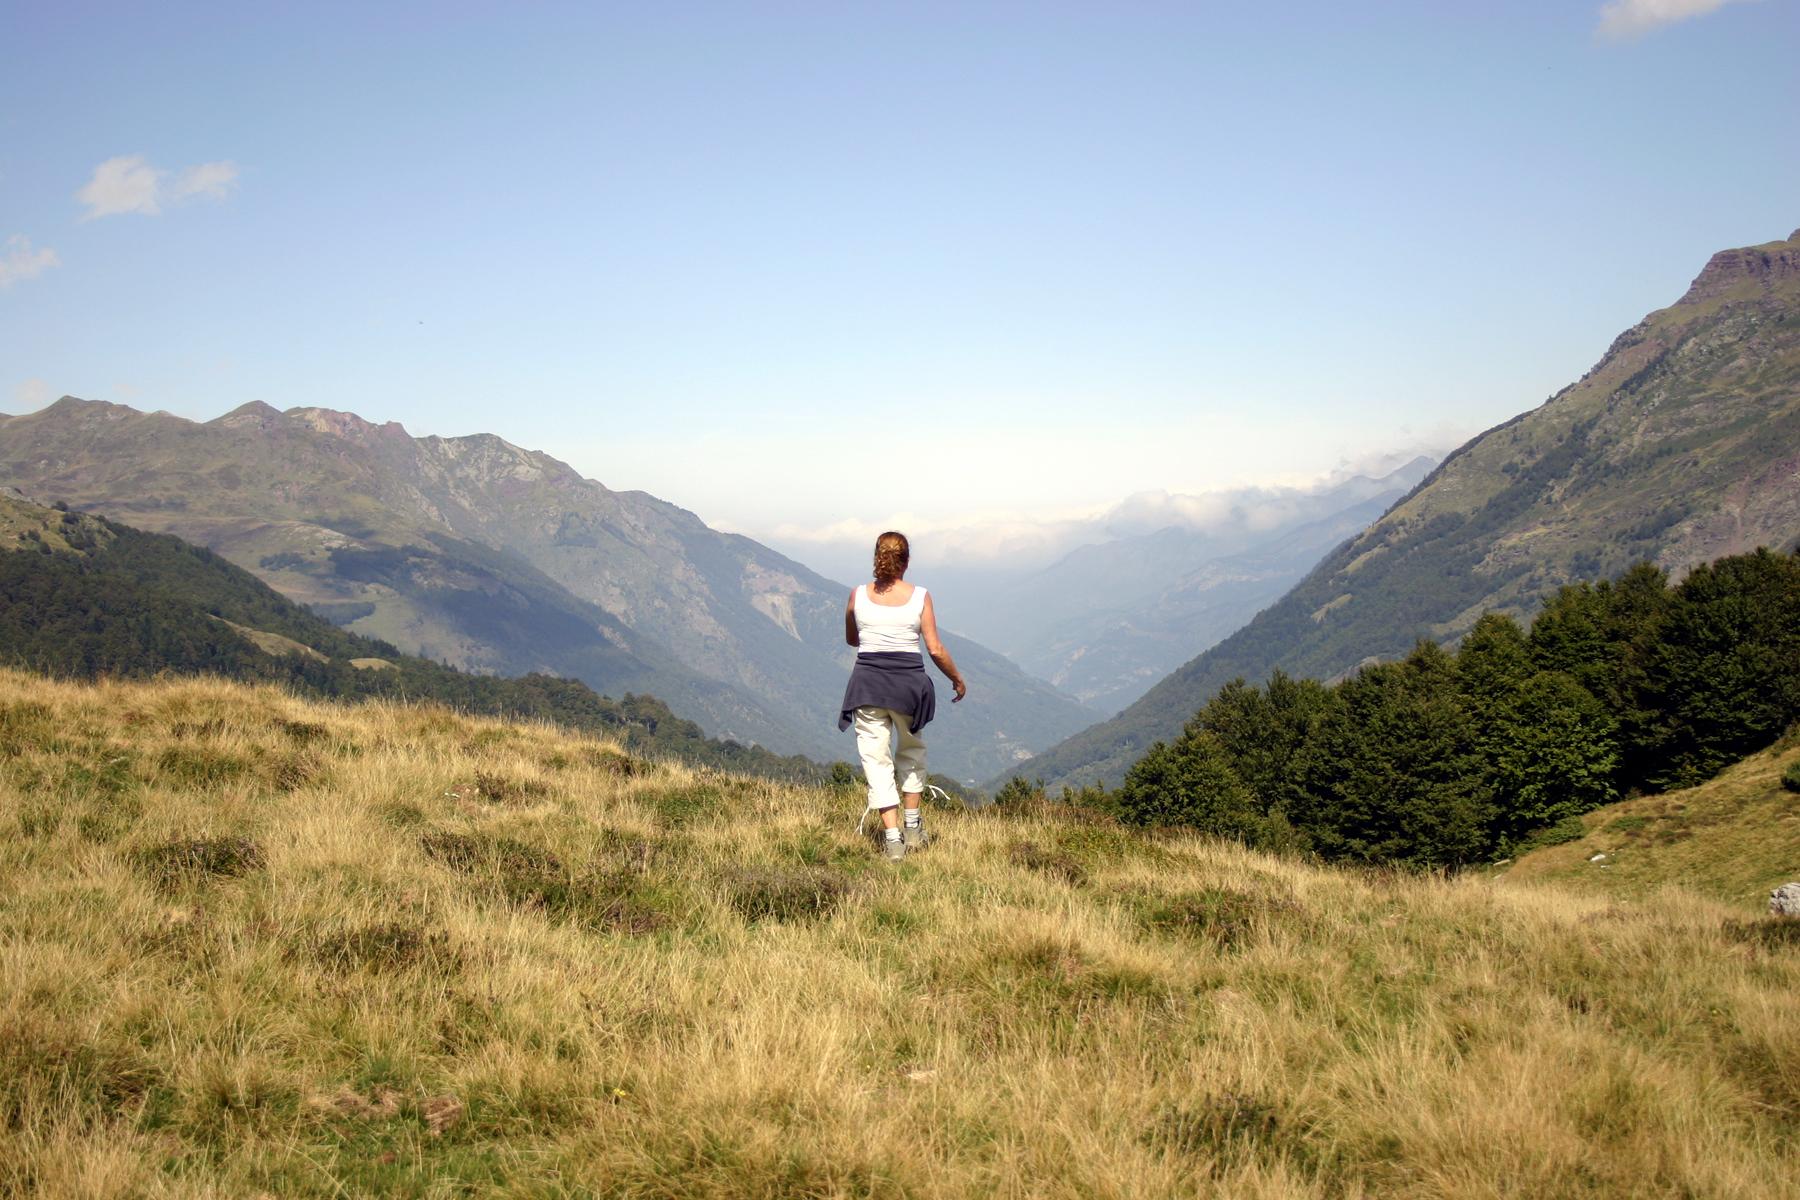 walking-on-the-mountain-1-1566594.jpg